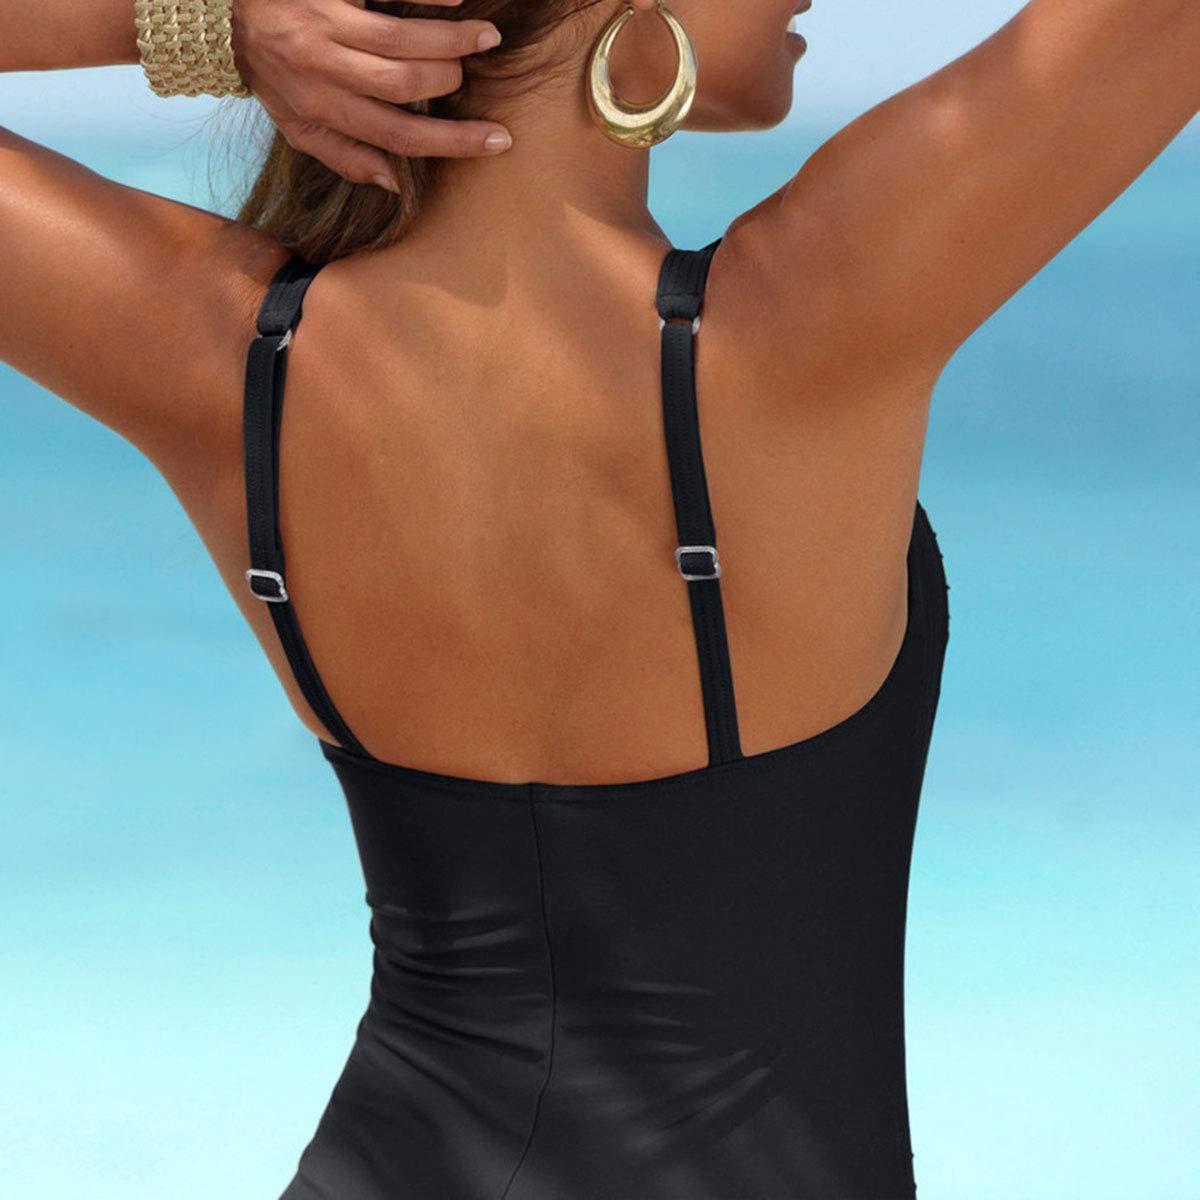 Sporzin Damen Badeanzug Push up Badeanzug Figurformender One Piece Bademode Neckholder Bademode Retro Shape Badeanzug